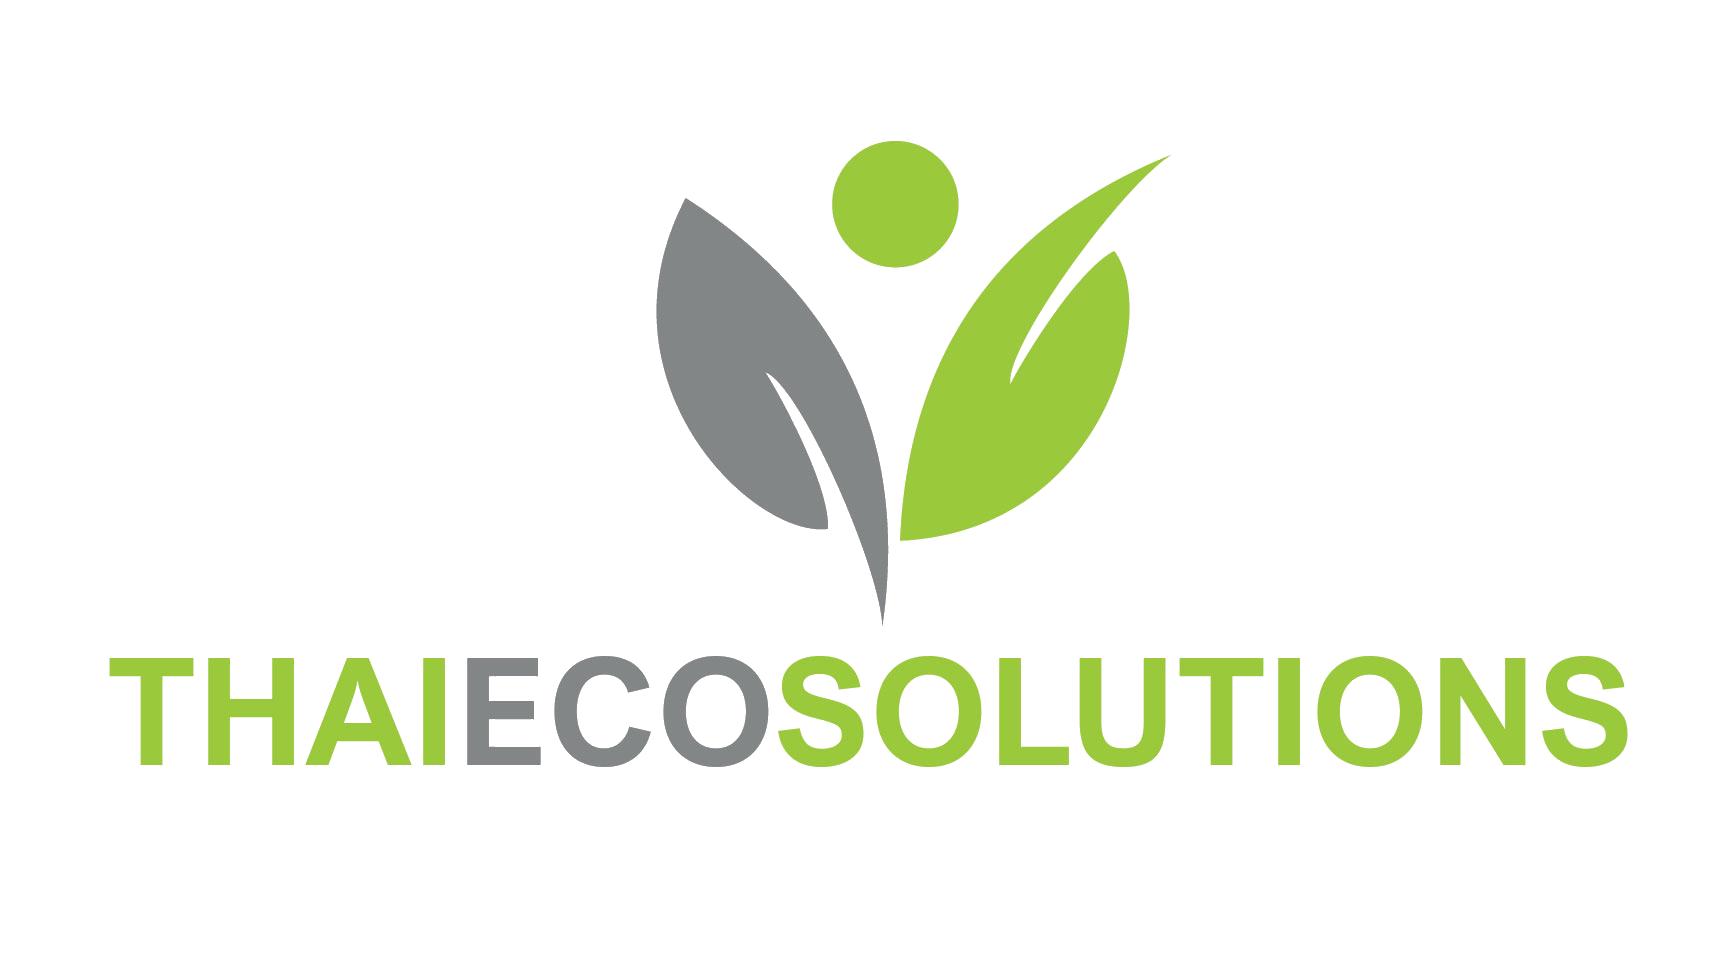 Thai Eco Solutions